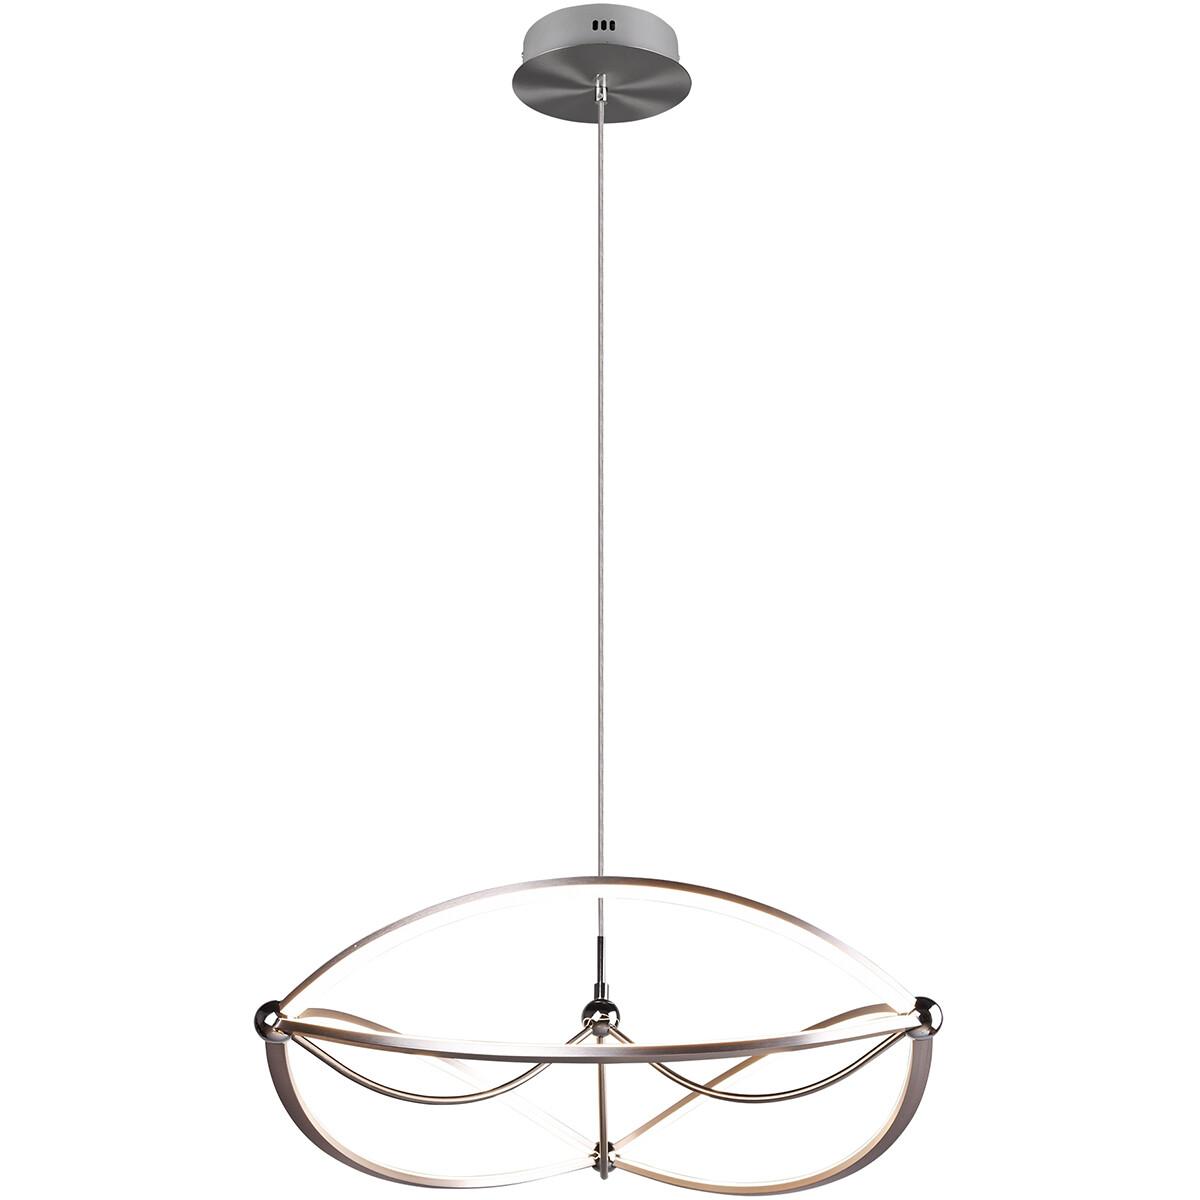 LED Hanglamp - Trion Charis - 42W - Warm Wit 3000K - Dimbaar - Rond - Mat Nikkel - Aluminium